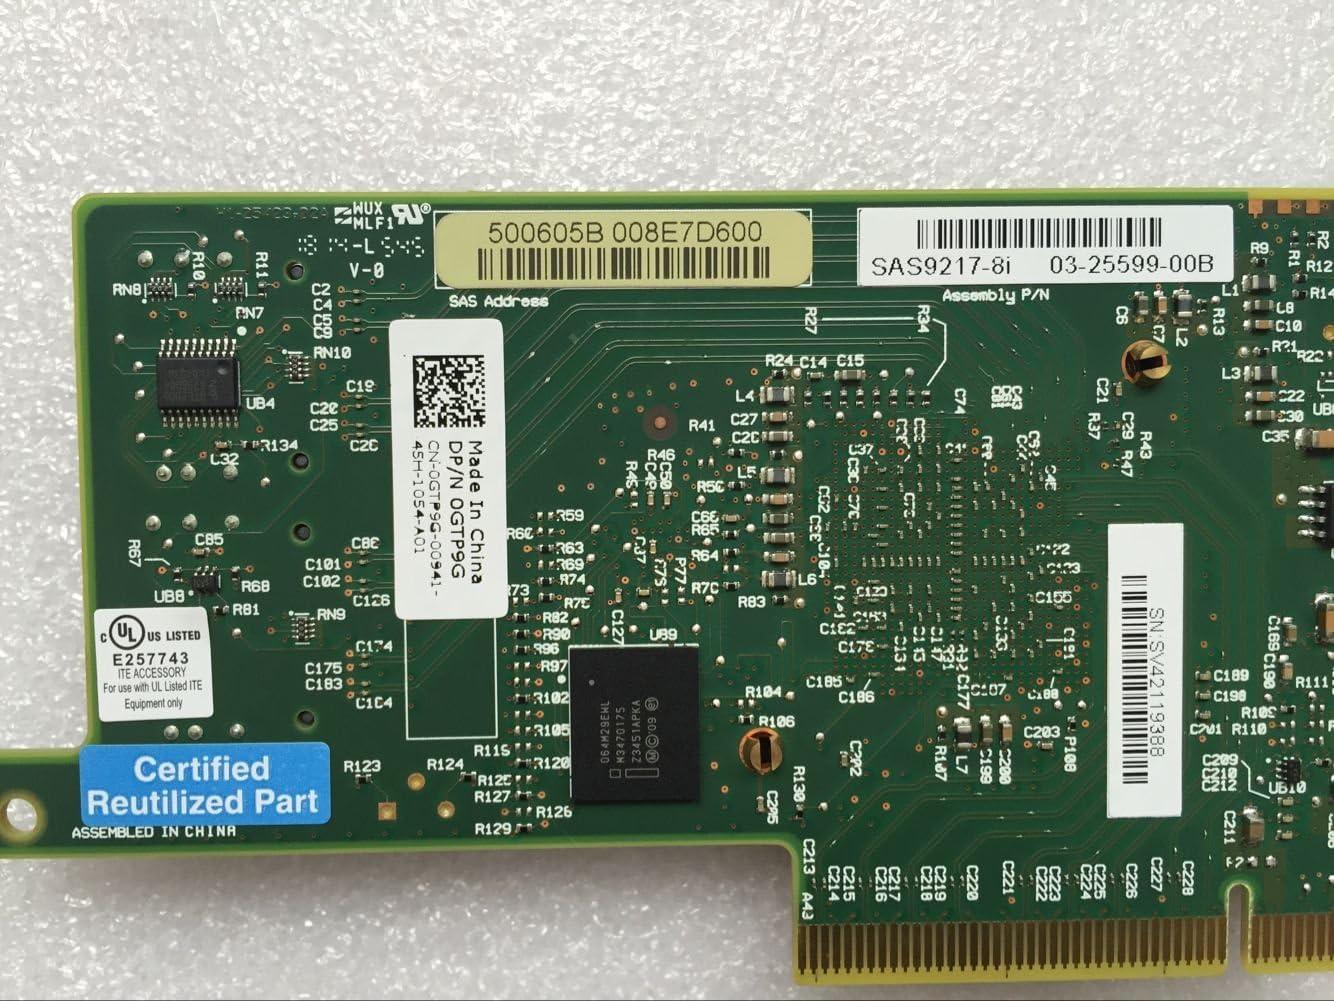 Dell//LSI SAS 9217-8i HBA 6GB//s PCI-e 3.0 x8 2X Internal Mini Ports Adapter